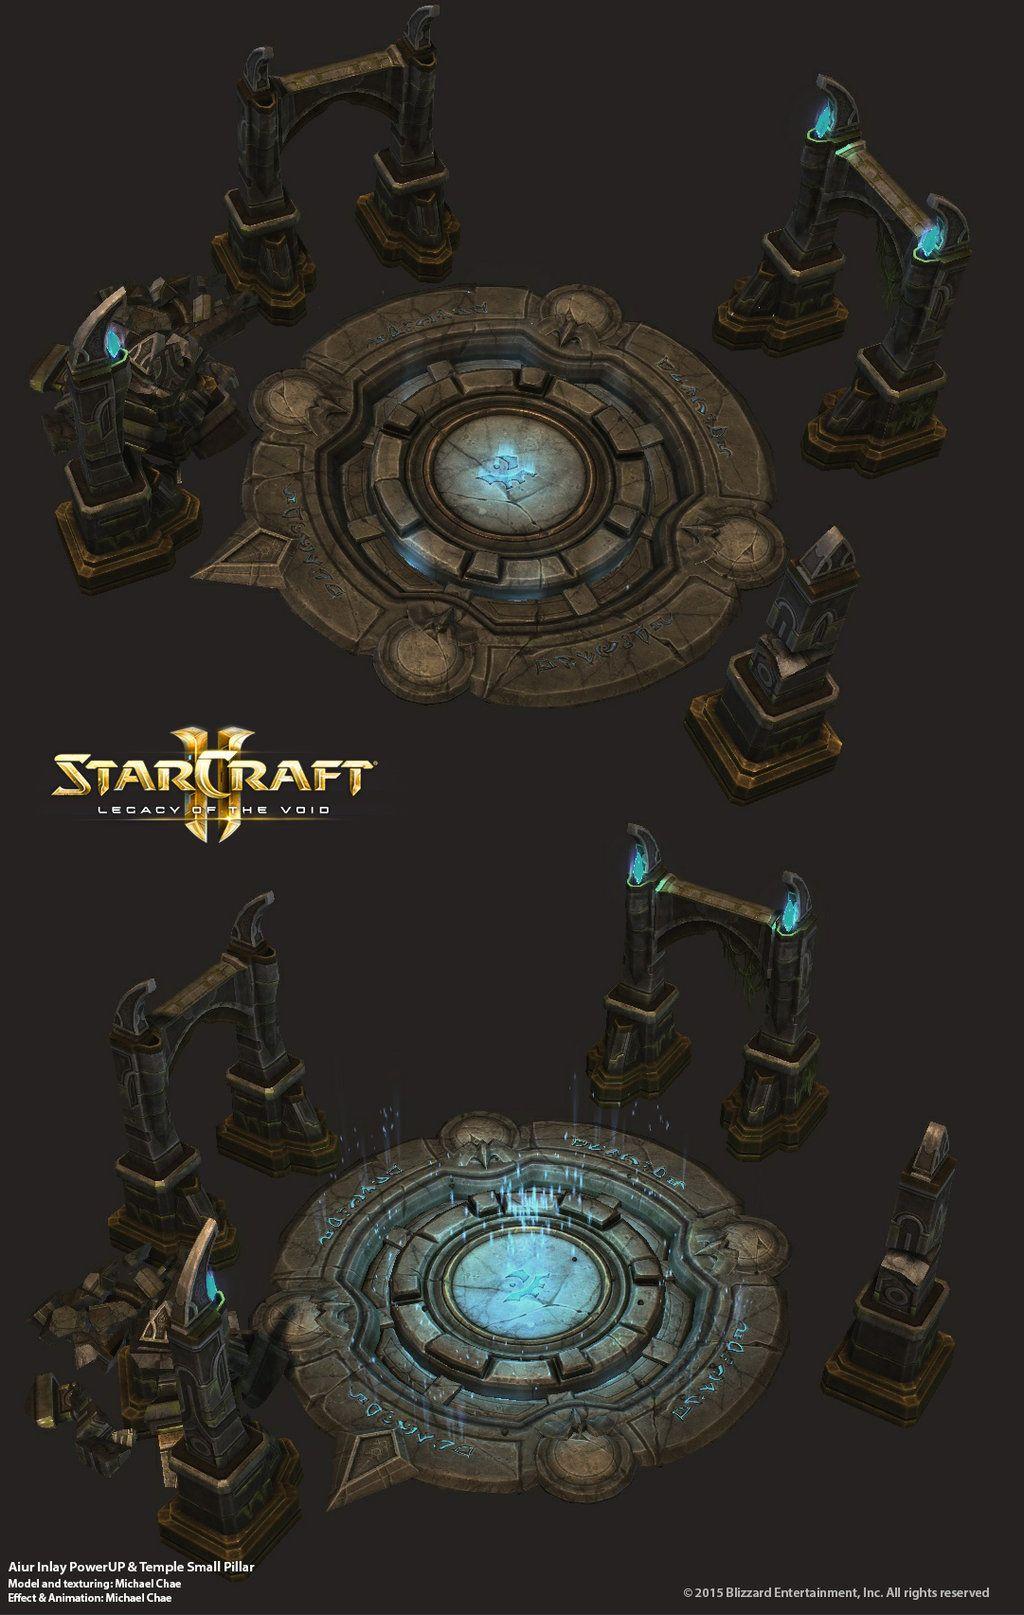 Starcraft2: Aiur Temple Inlay by 3dchae deviantart com on